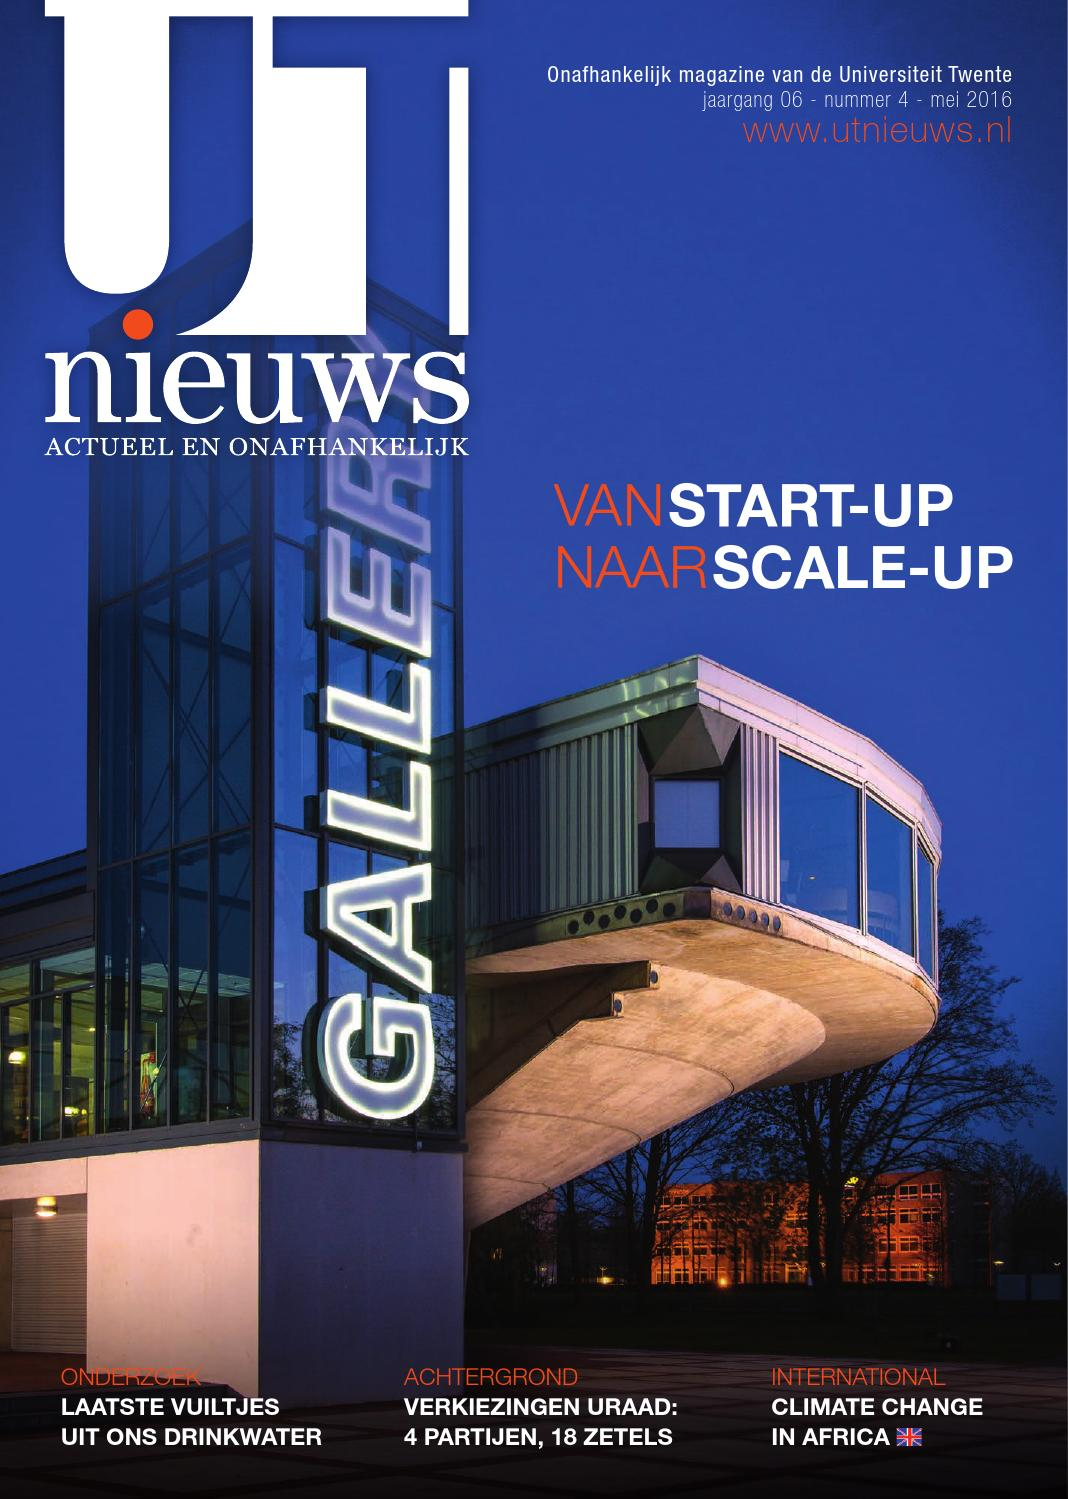 Ut nieuws magazine maart 2016 by redactie ut nieuws   issuu